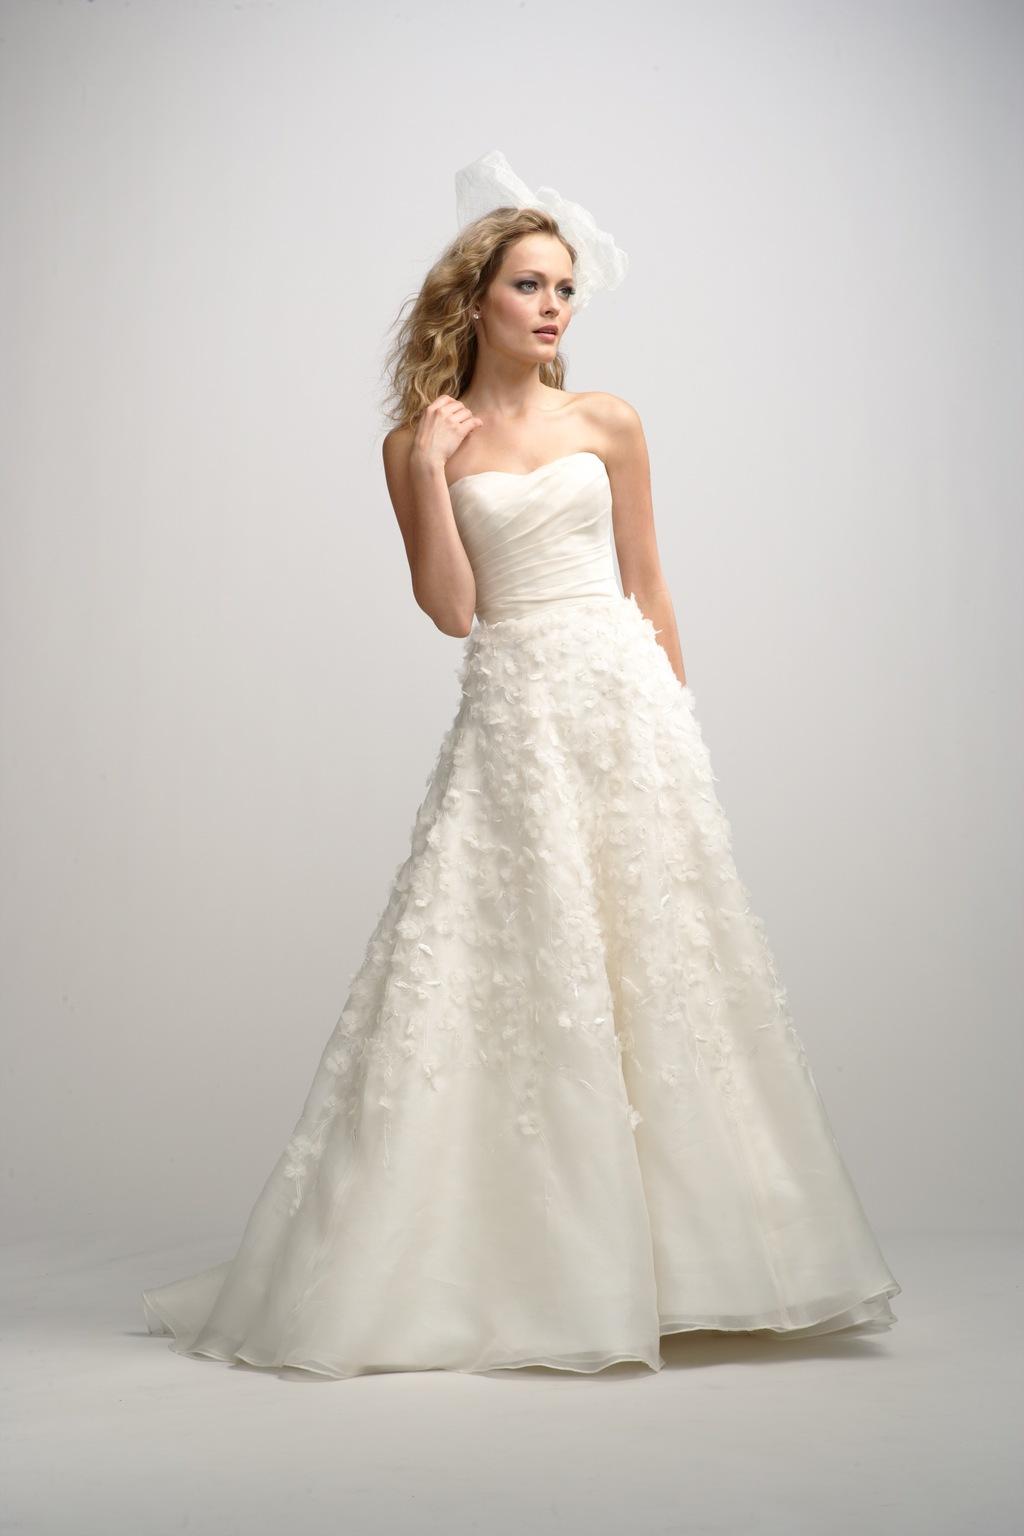 Fall-2012-wedding-dress-watters-bridal-gown-15.original.full